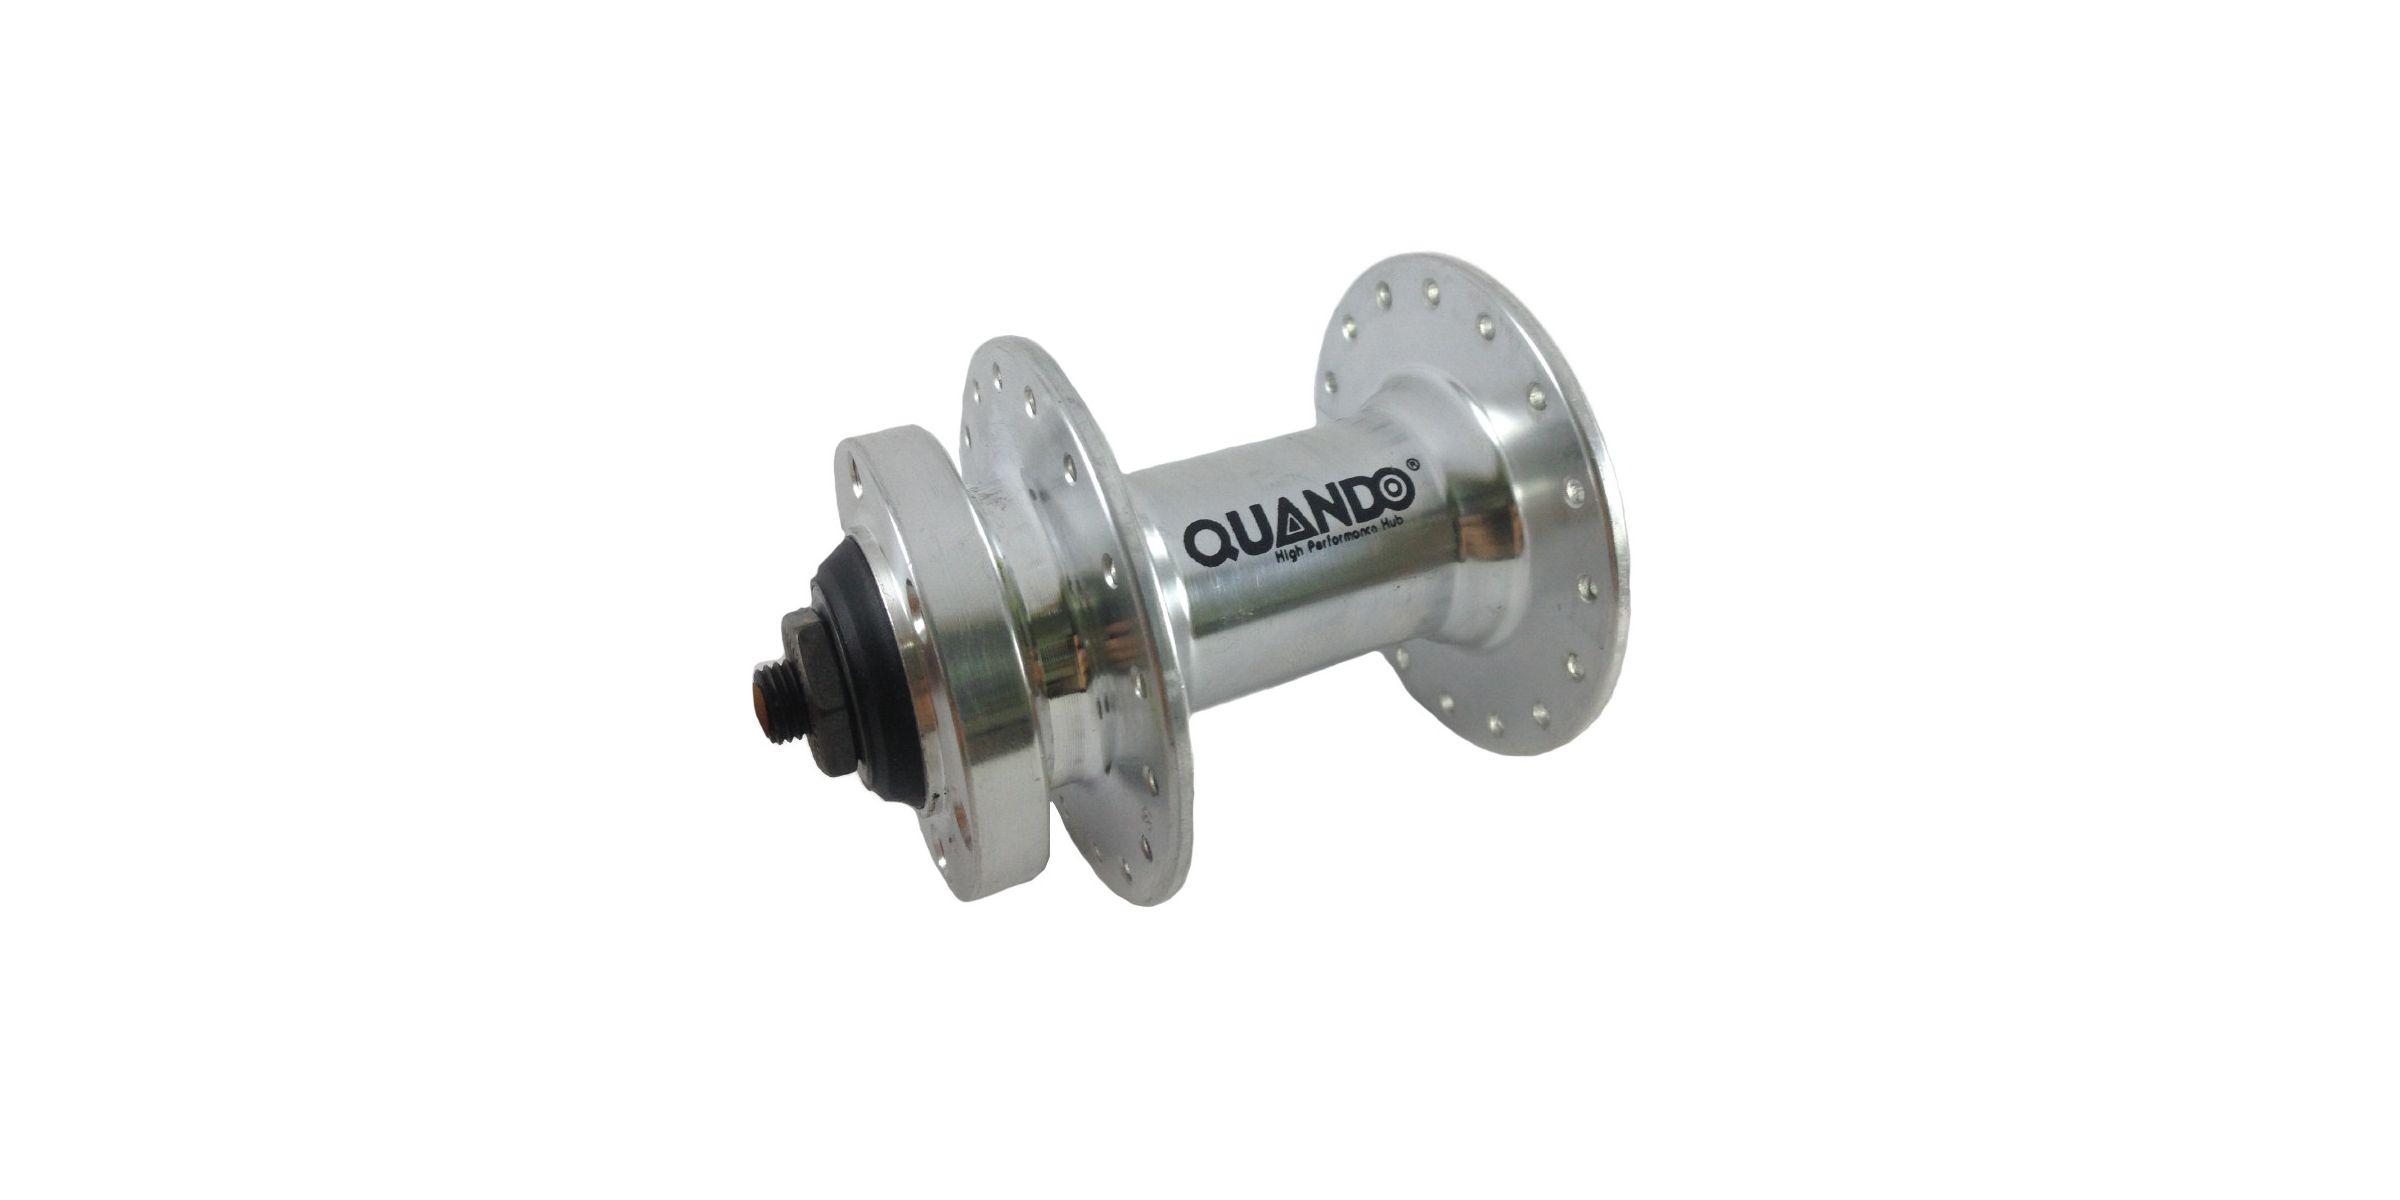 Втулка передняя QUANDO KT-FMD7 PSP-0046